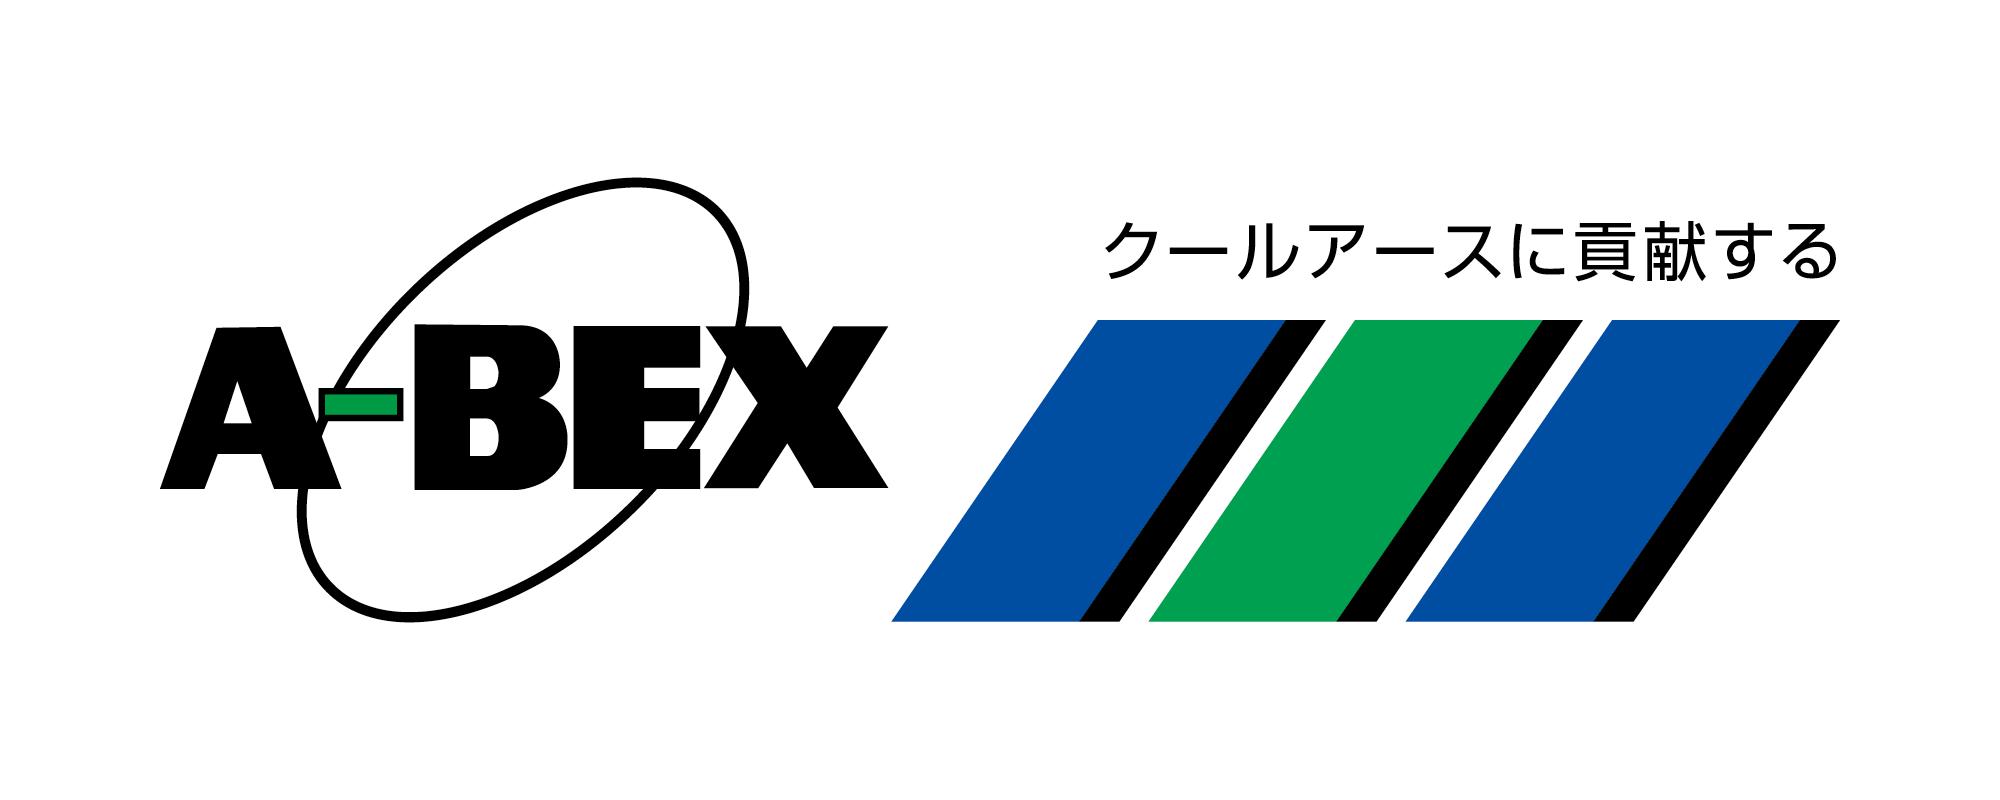 https://www.a-bex.com/wp/wp-content/uploads/2021/07/logo_a-bex-01.png